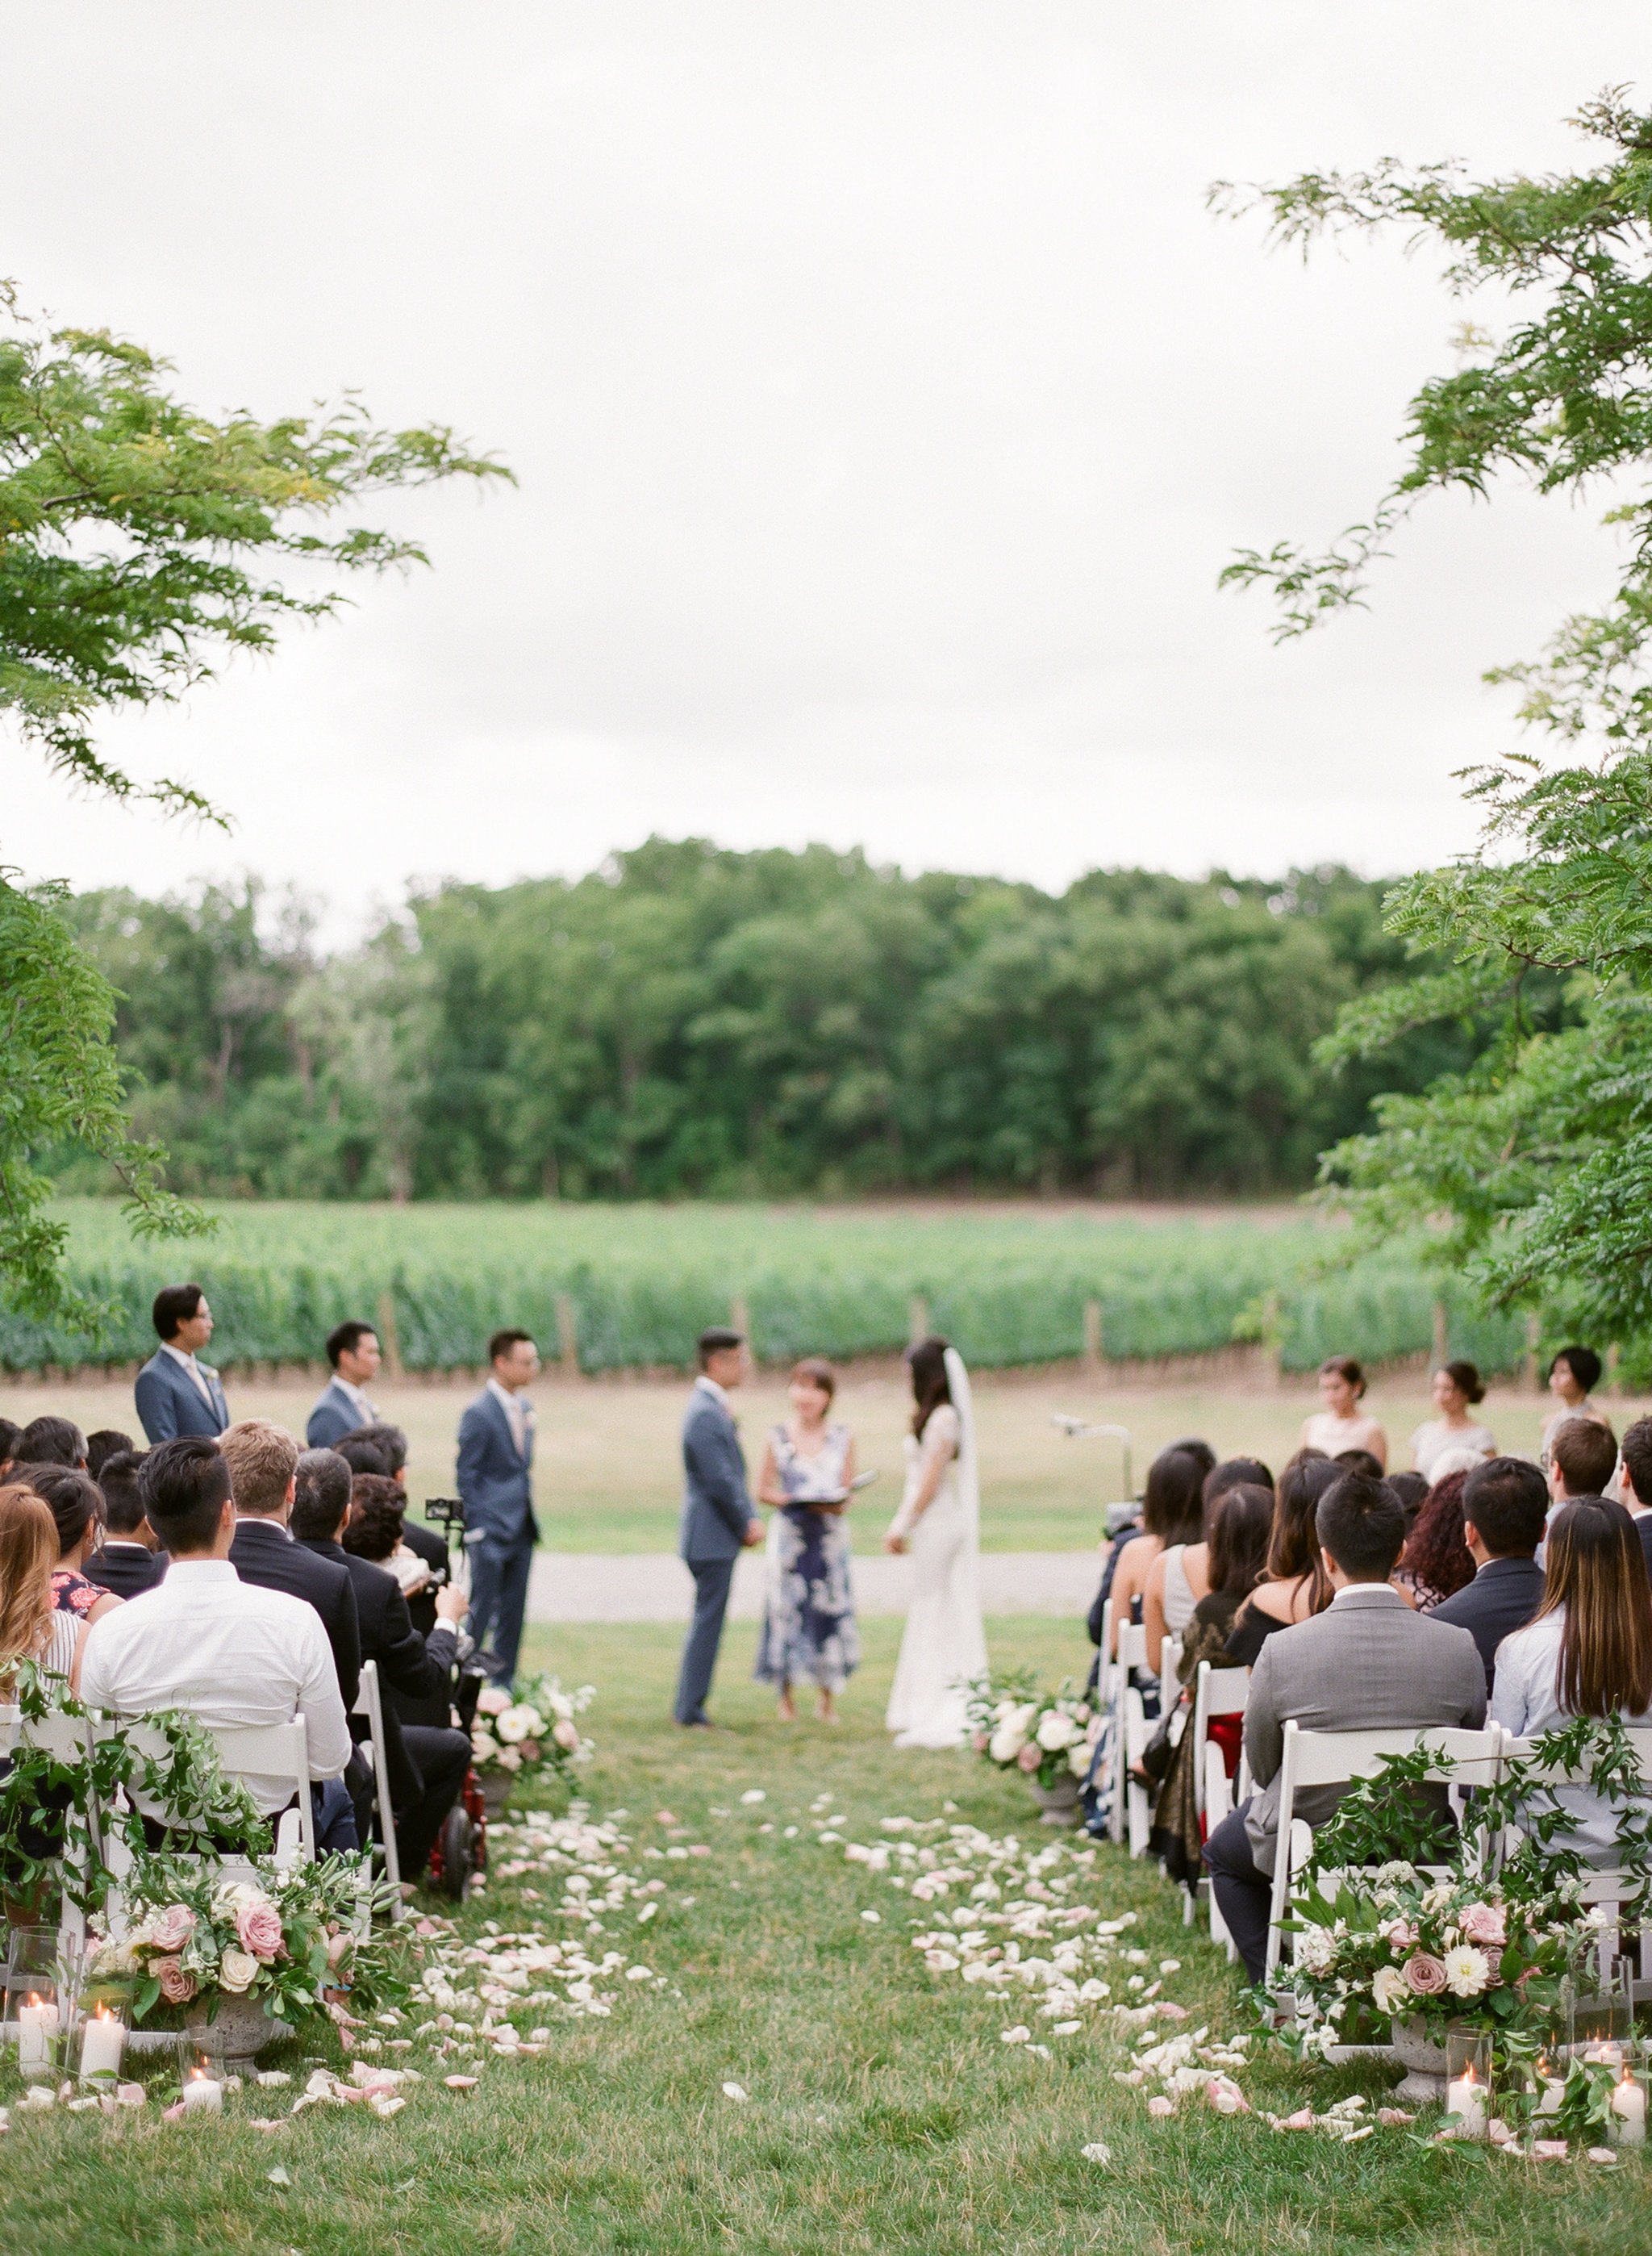 0906-artiese-chateau-des-charmes-wedding-sonia-tim-000095330009.jpg